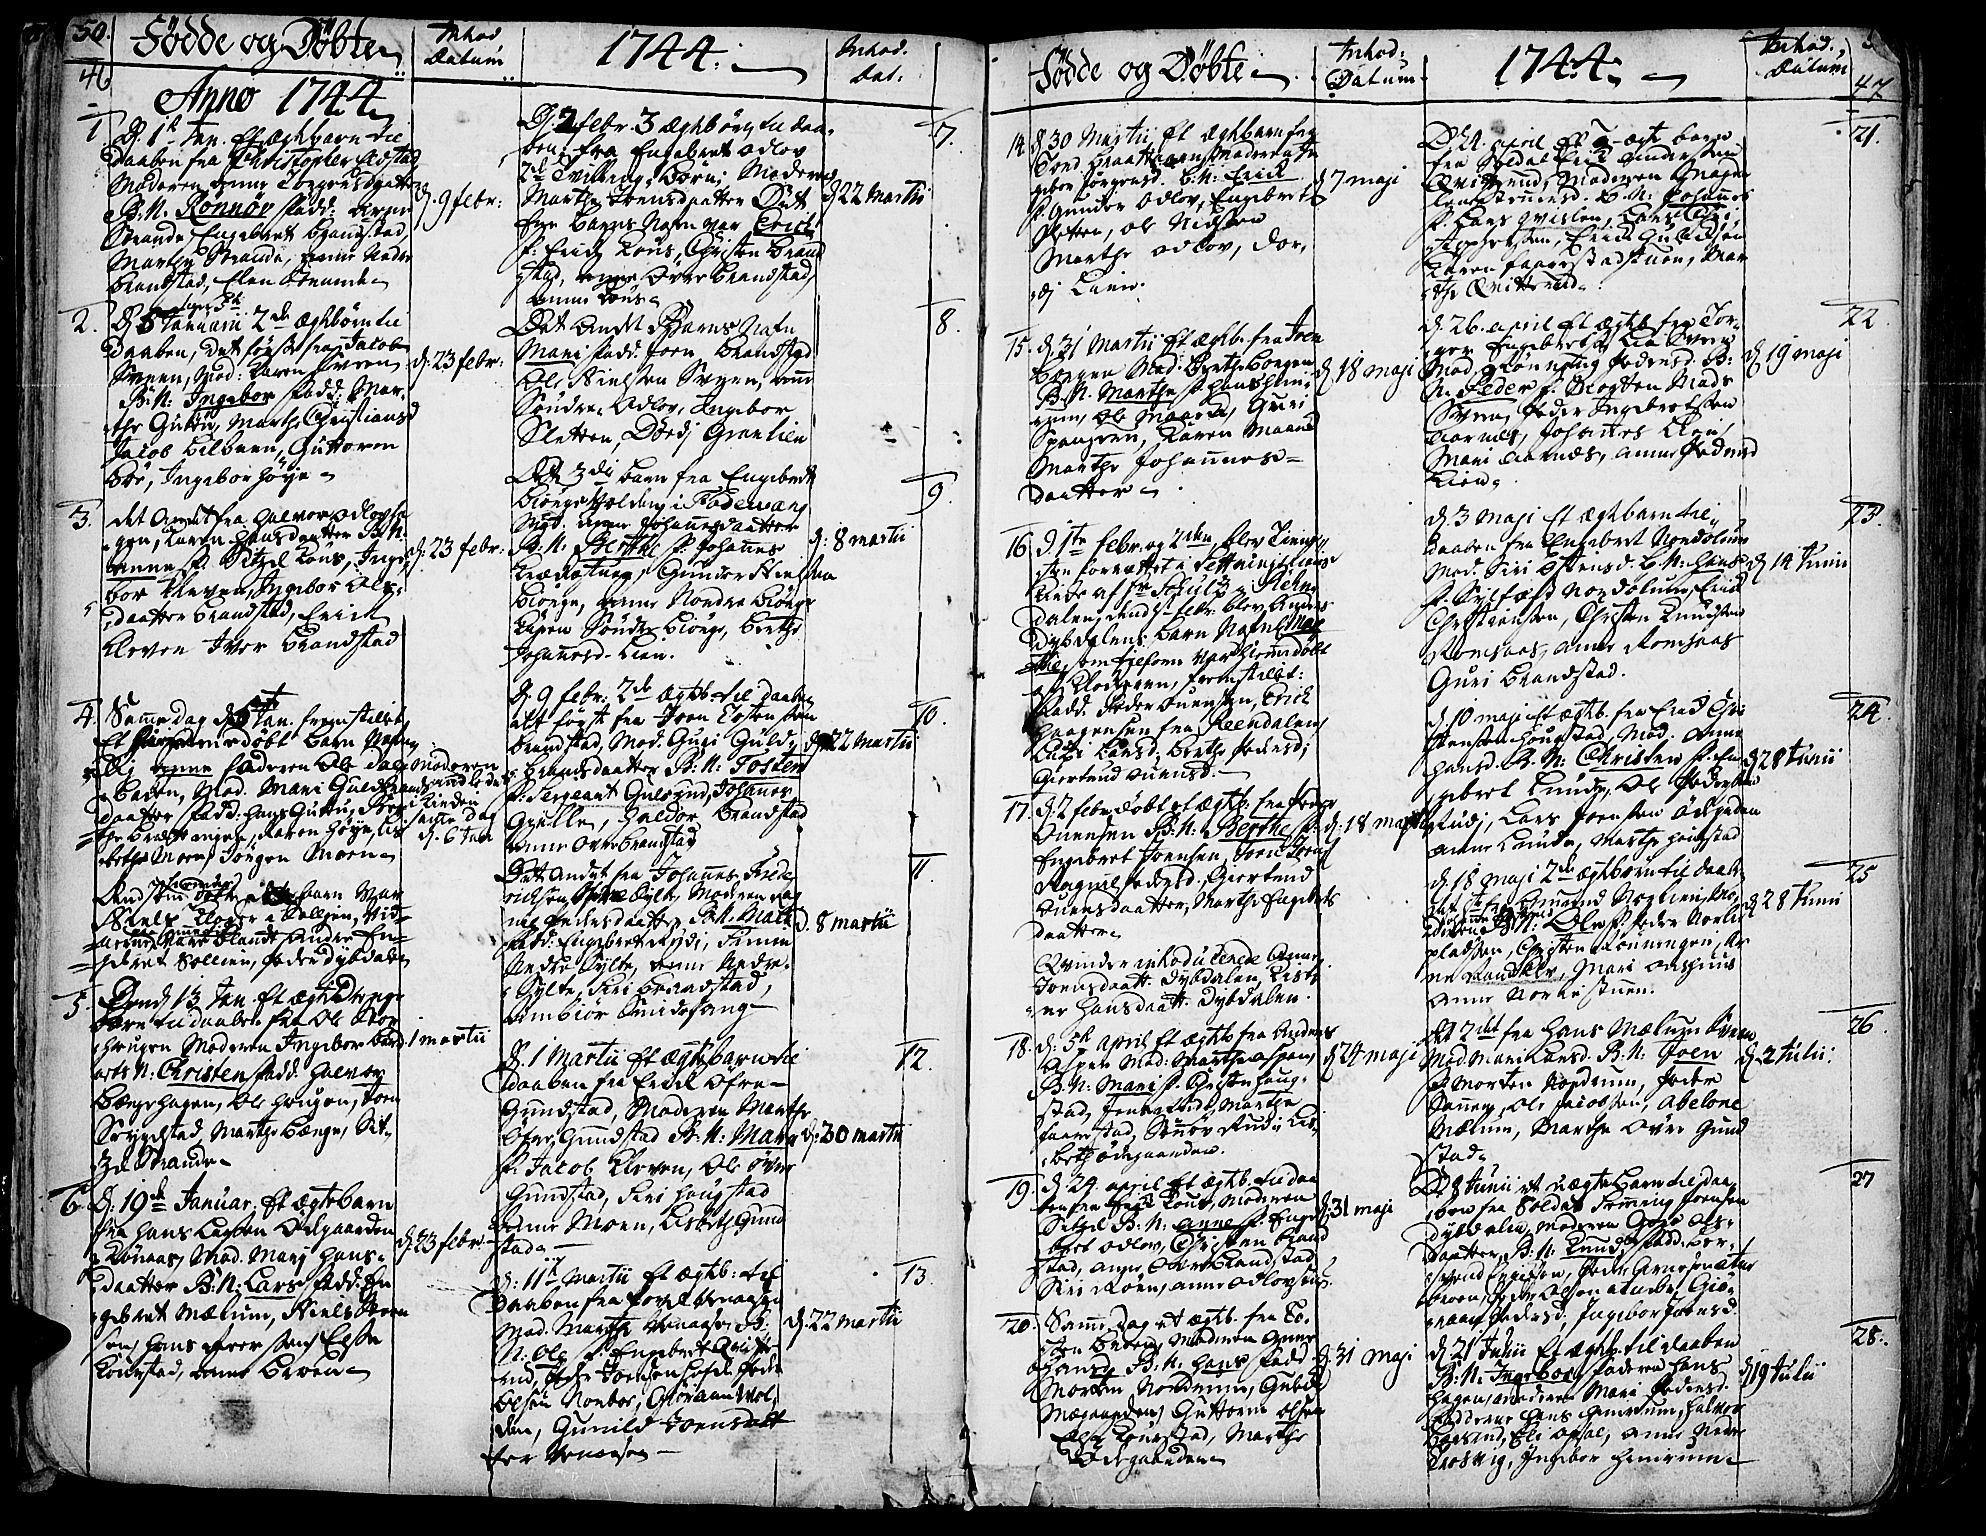 SAH, Ringebu prestekontor, Ministerialbok nr. 2, 1734-1780, s. 46-47